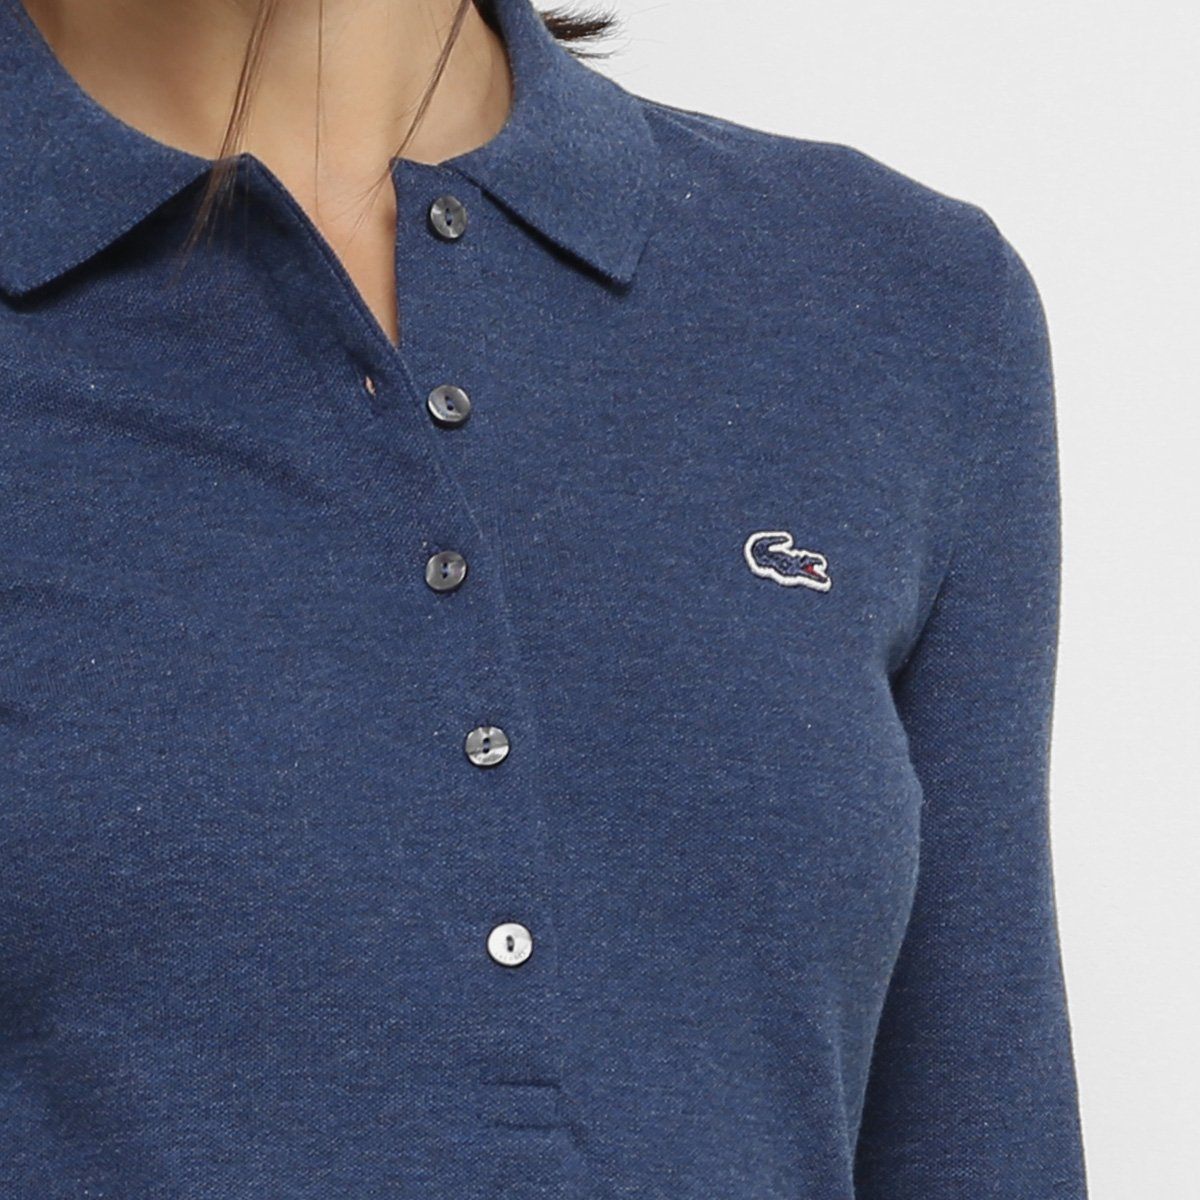 c31814f9825bf Camisa Polo Lacoste Manga Longa Botões Feminina - Compre Agora   Zattini